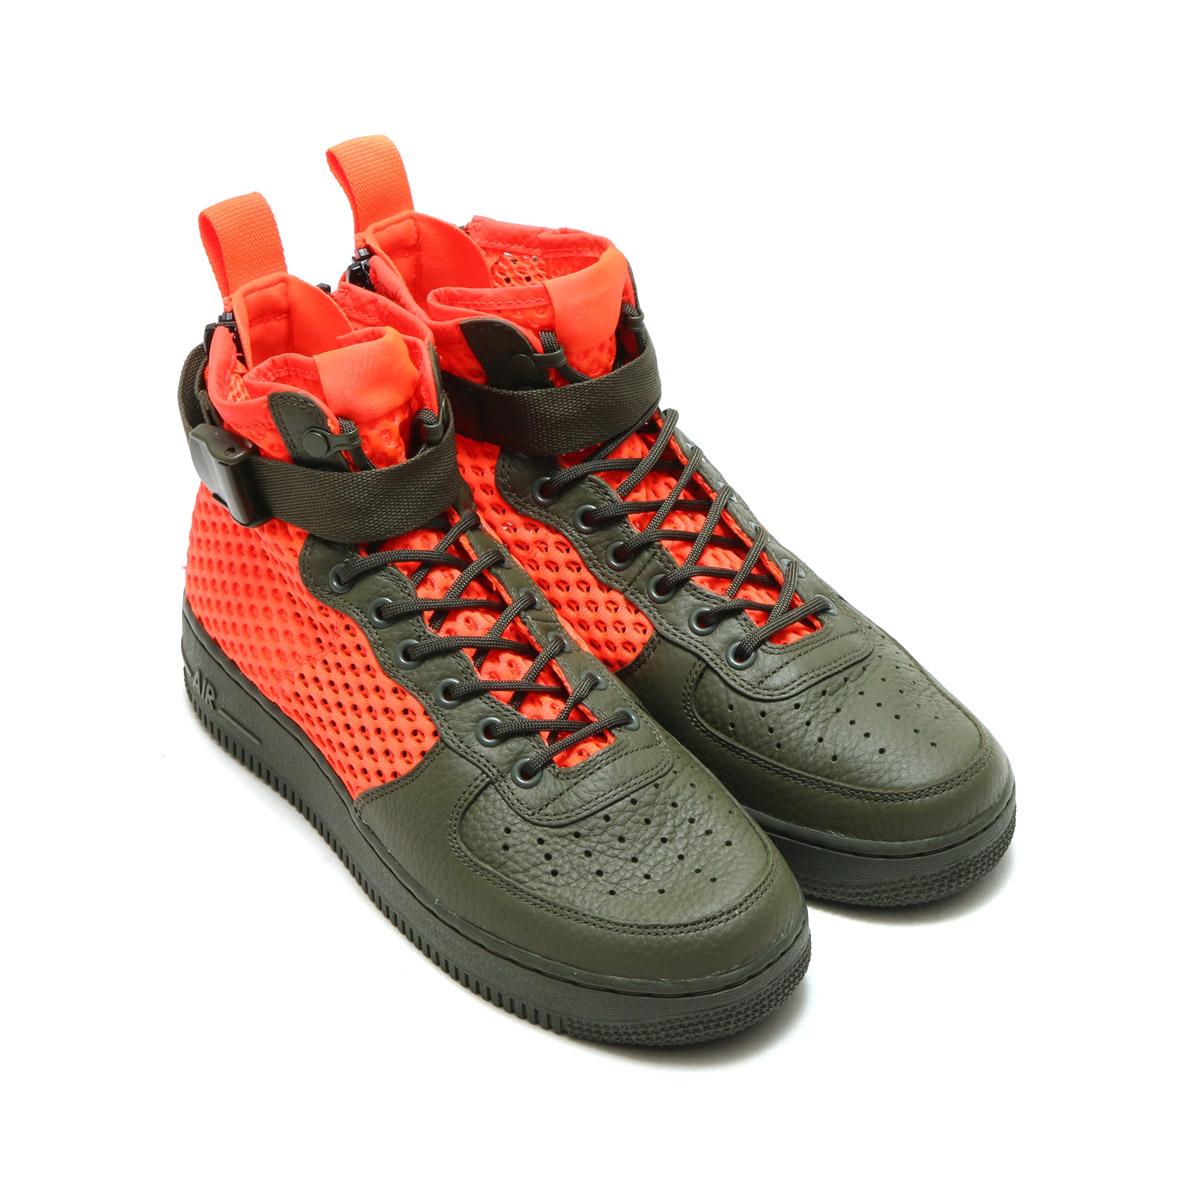 Nike Khaki17fa 1 Qscargo Af1 Qsnike S Field Special Mid Khakitotal Crimson Force Sf Cargo Air PZiXku